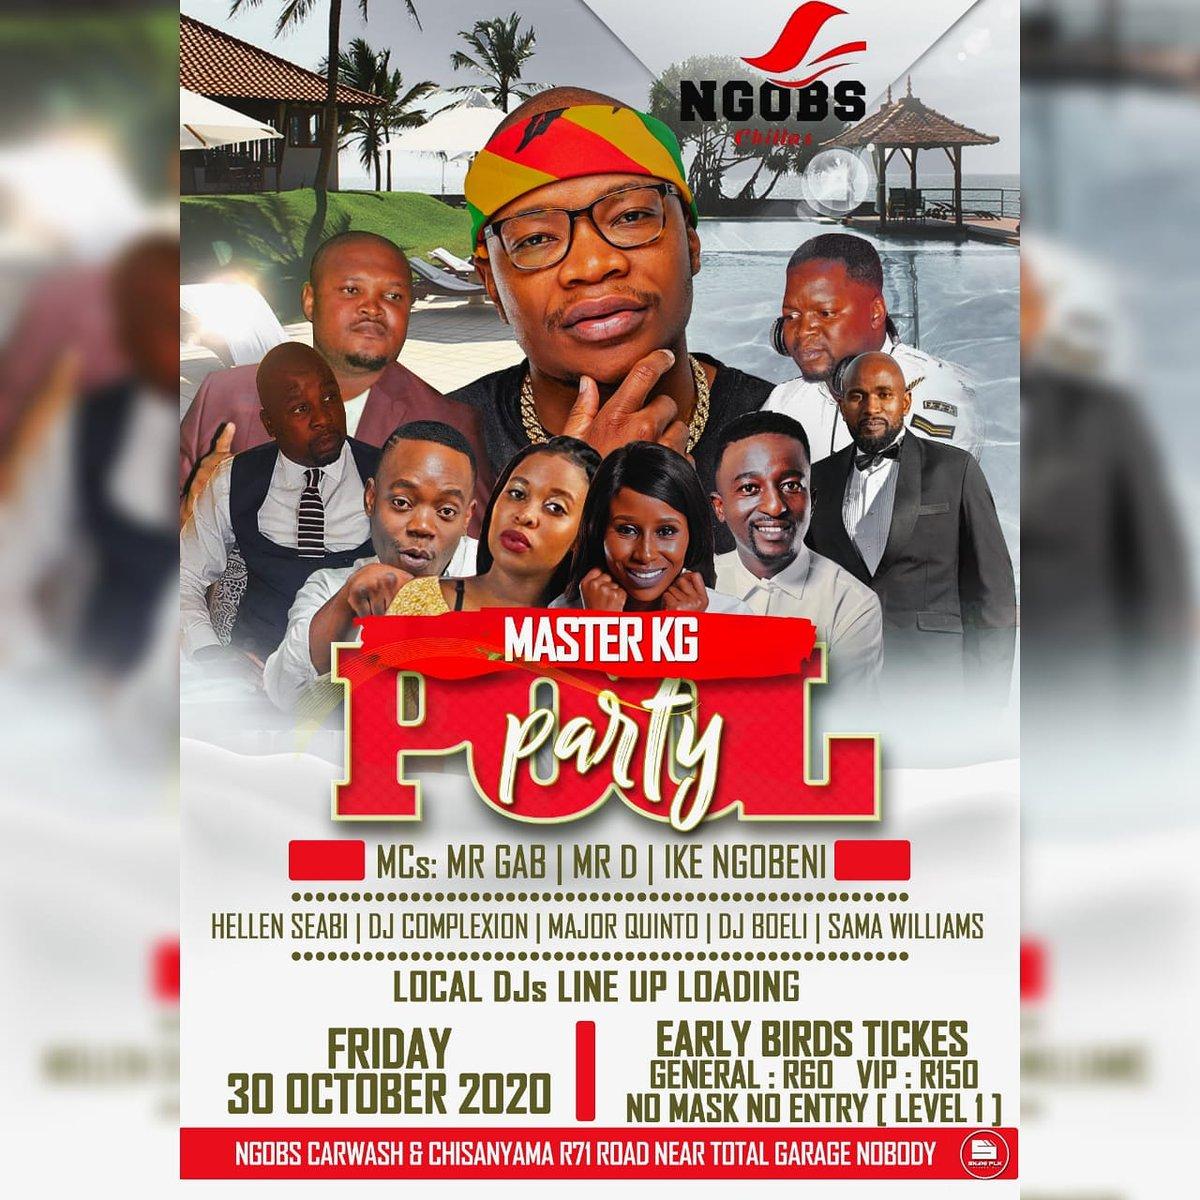 NGOBS CARWASH & CHISANYAMA  brings you @MasterKGsa Live supported Dj Boeli & more Date: Fri 30 Oct 2020... DJ BOELI Booking Details:  📧: djboeli@yahoo.com  ☎️: 081 306 9279 (Calls/WhatsApp) Facebook: Dj Boeli Fans Page Instagram: @DjBoeli Twitter: @DjBoeli https://t.co/Y7oW5b6BfJ